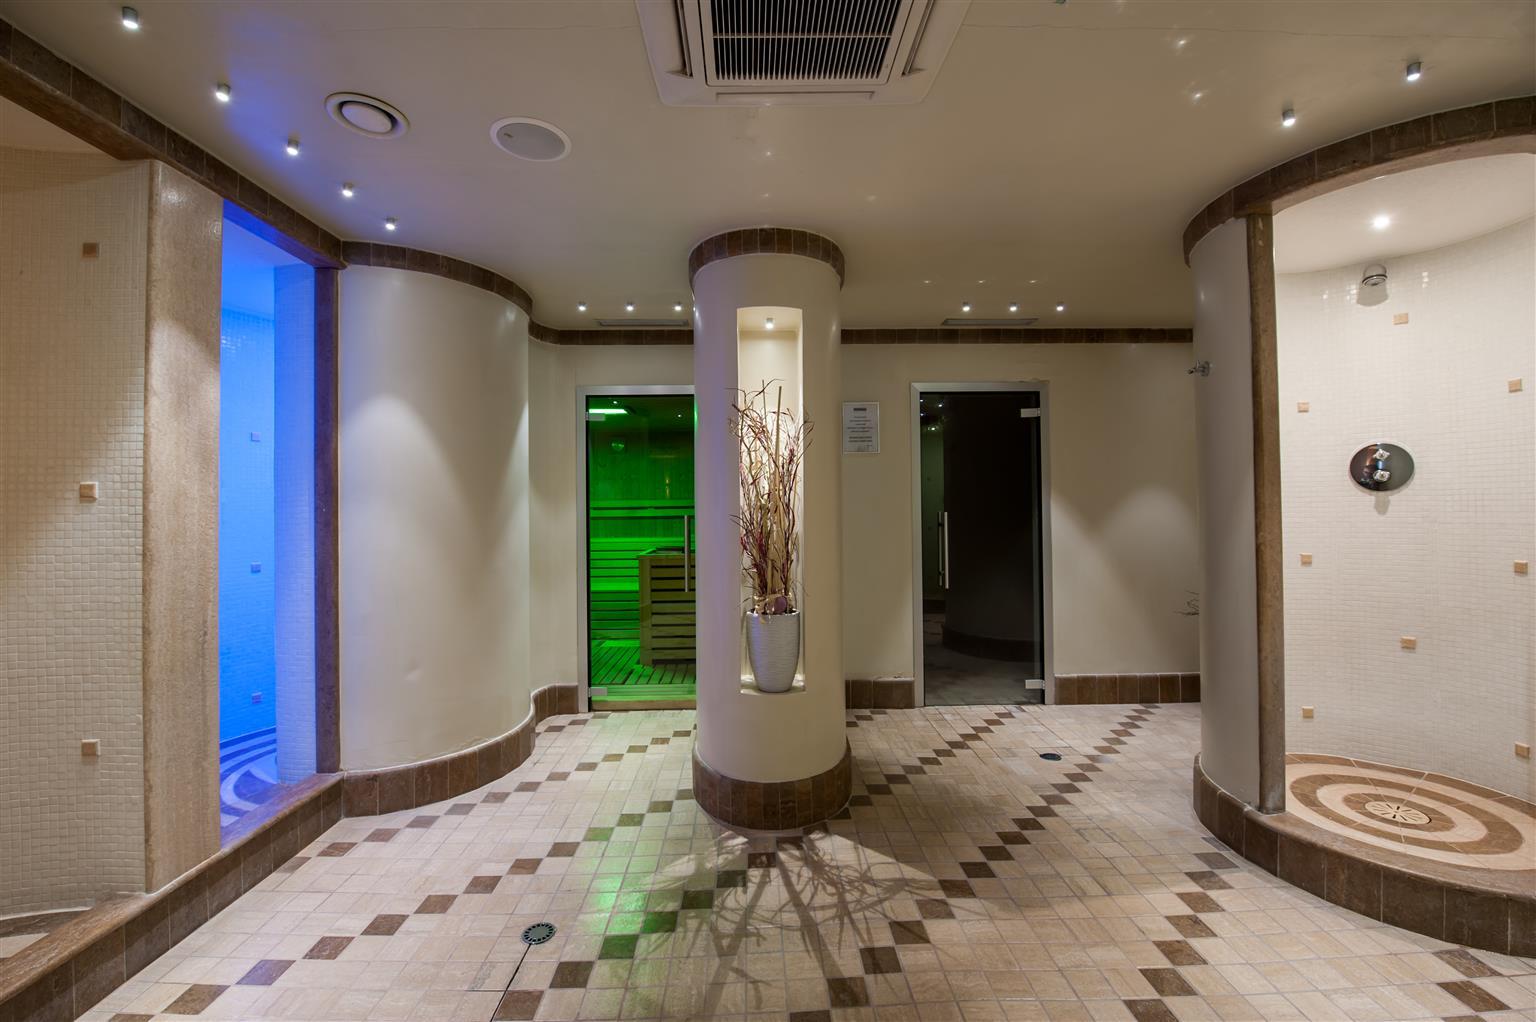 Immagine BEST WESTERN PREMIER VILLA FABIANO PALACE HOTEL